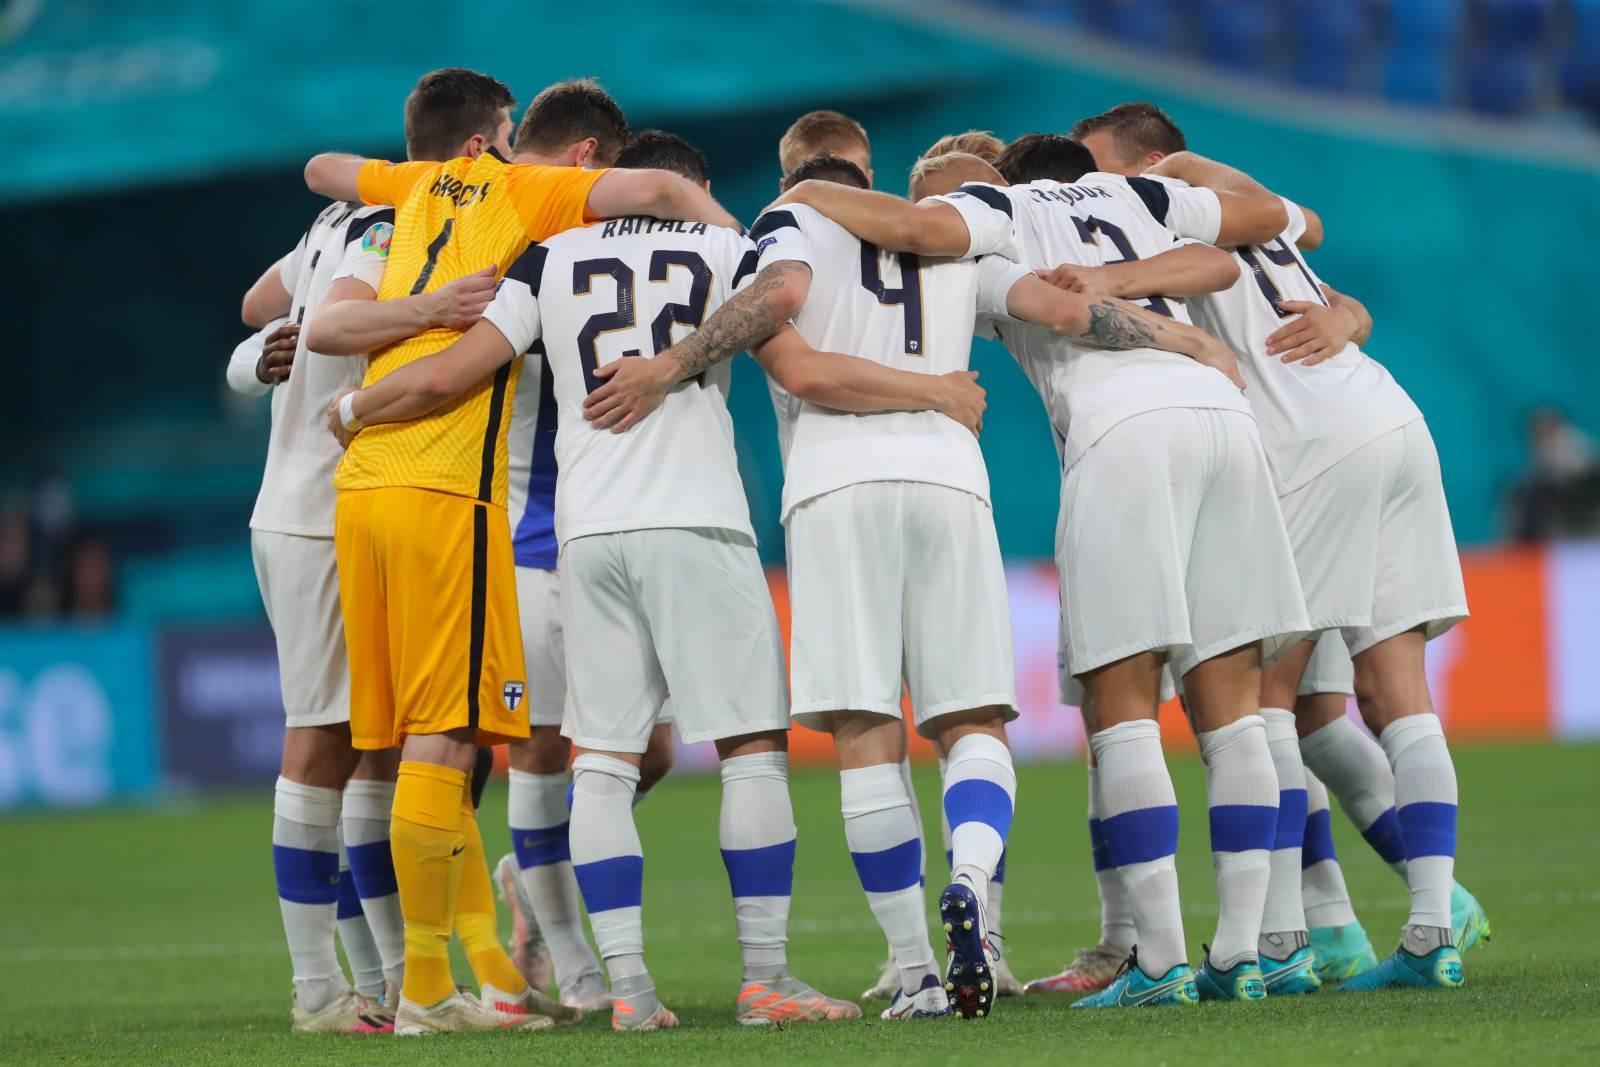 Казахстан – Финляндия: прогноз на матч отборочного цикла чемпионата мира-2022 - 12 октября 2021